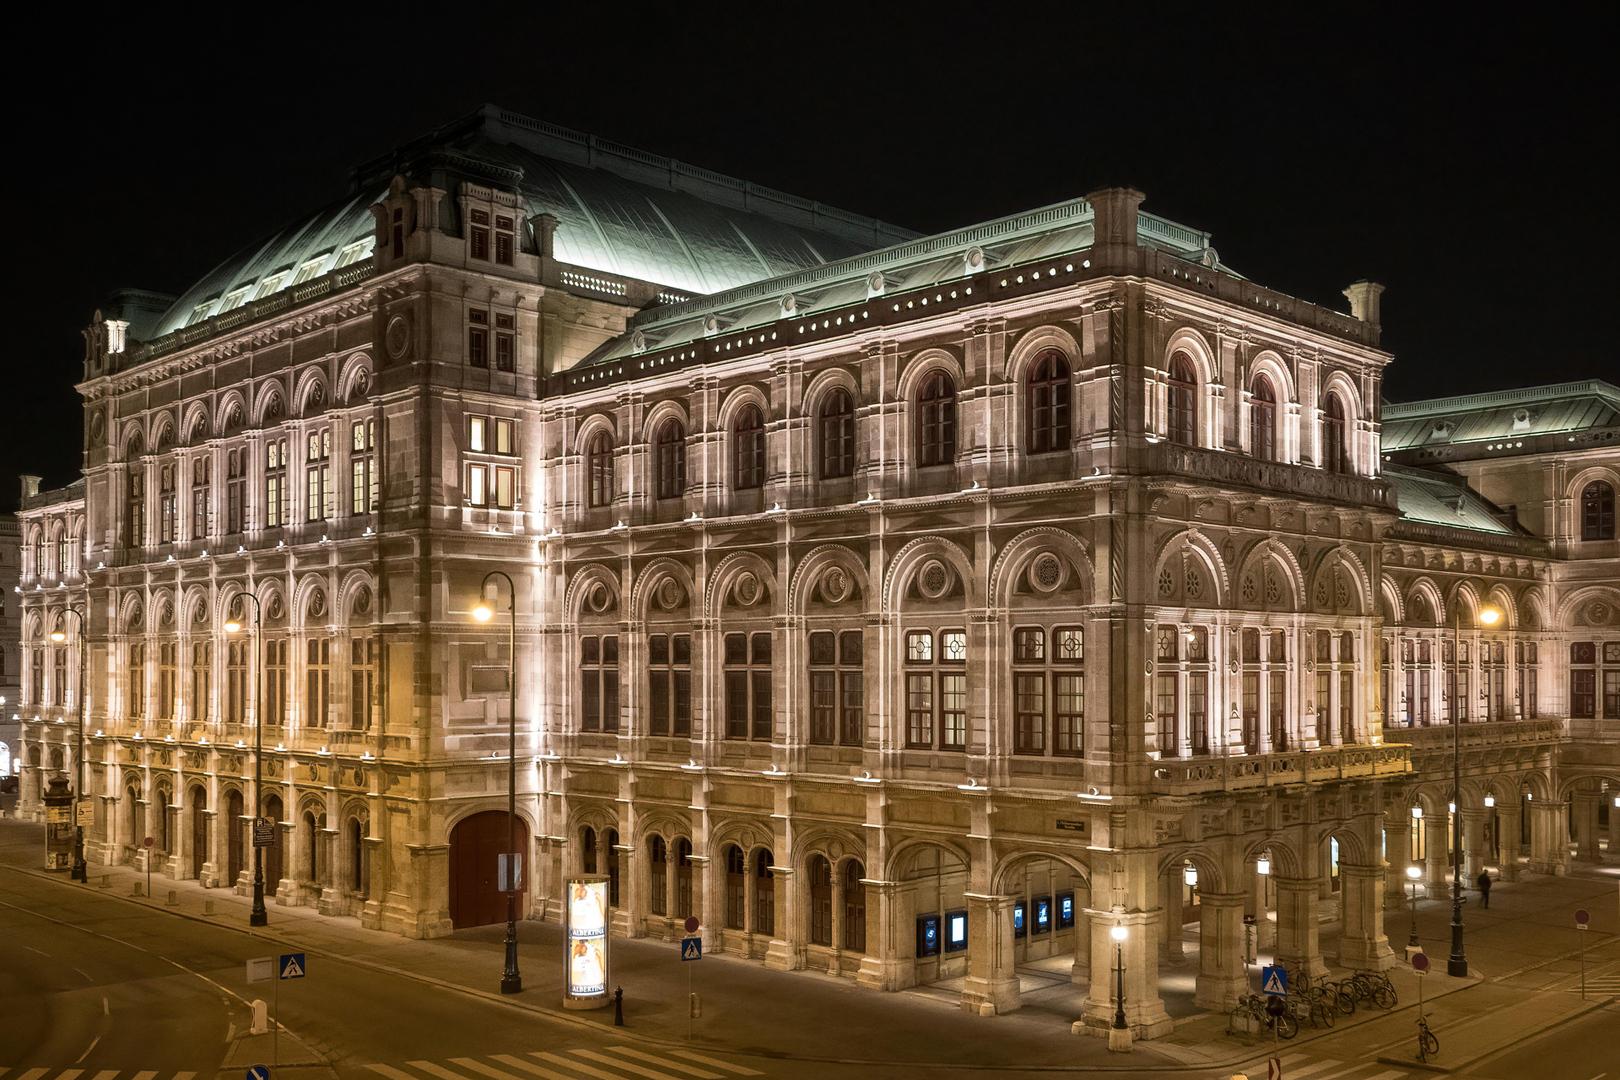 AT Wiener Staatsoper